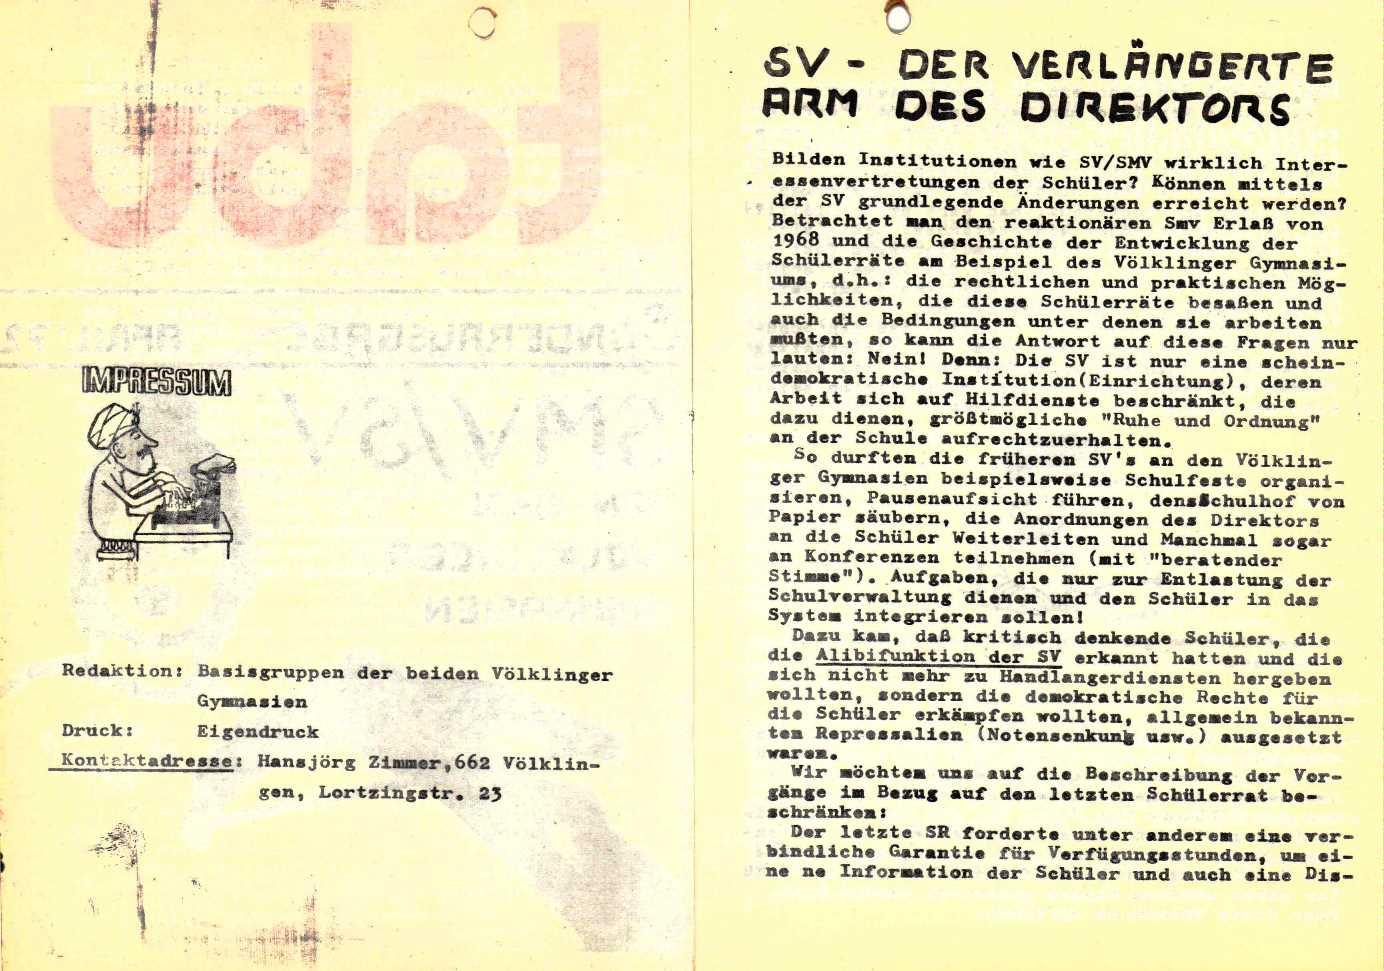 Saarland_SMV249